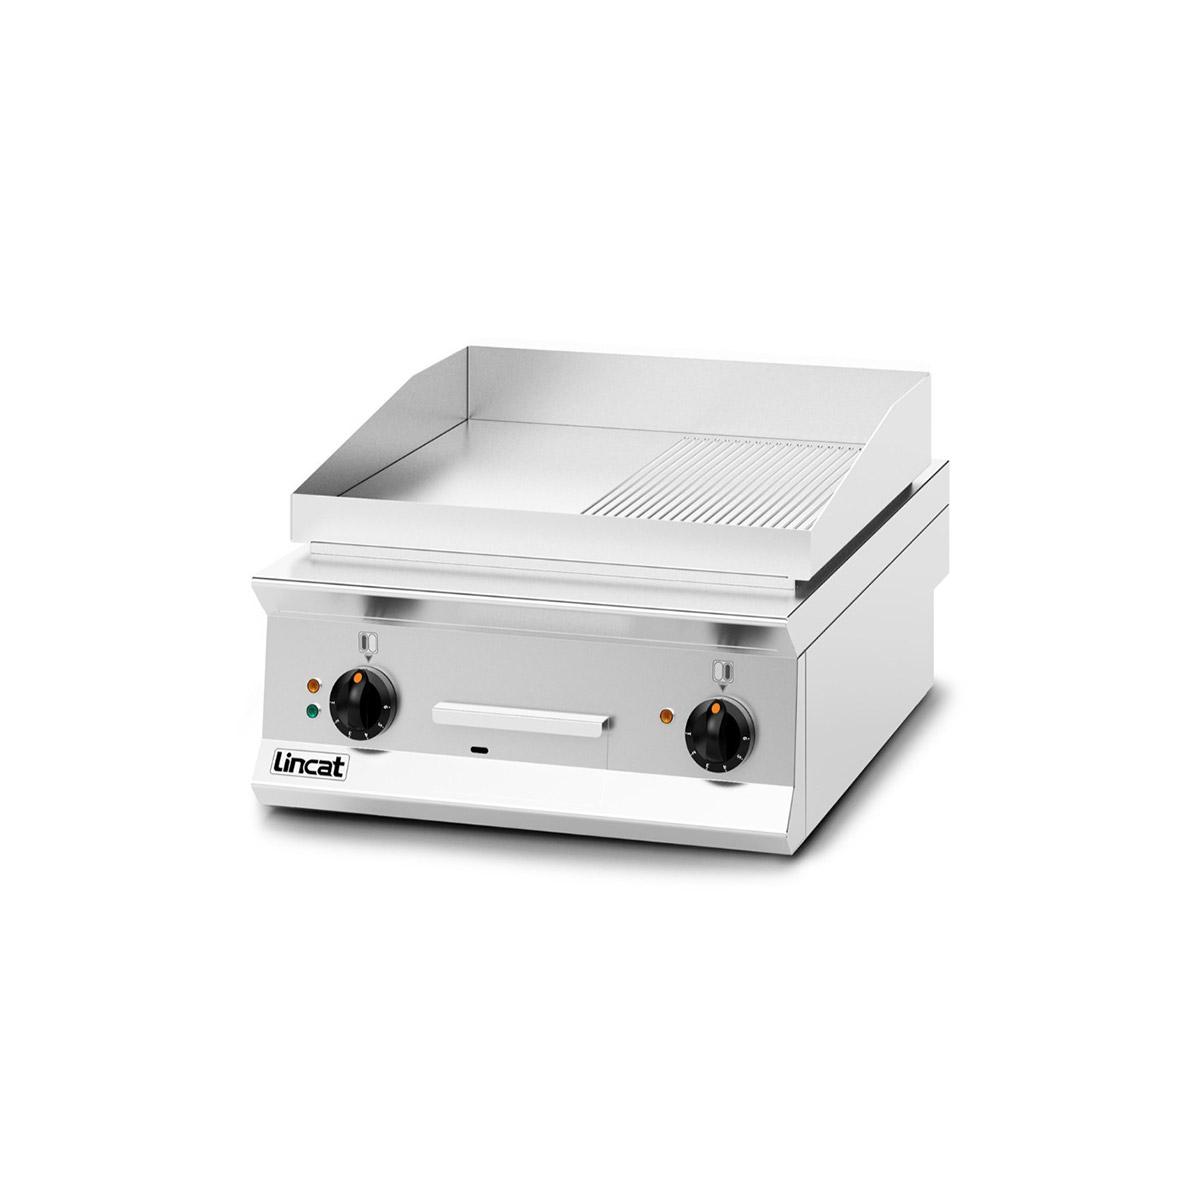 Lincat Opus 800 Half Ribbed Electric Griddle Model: OE8205/R